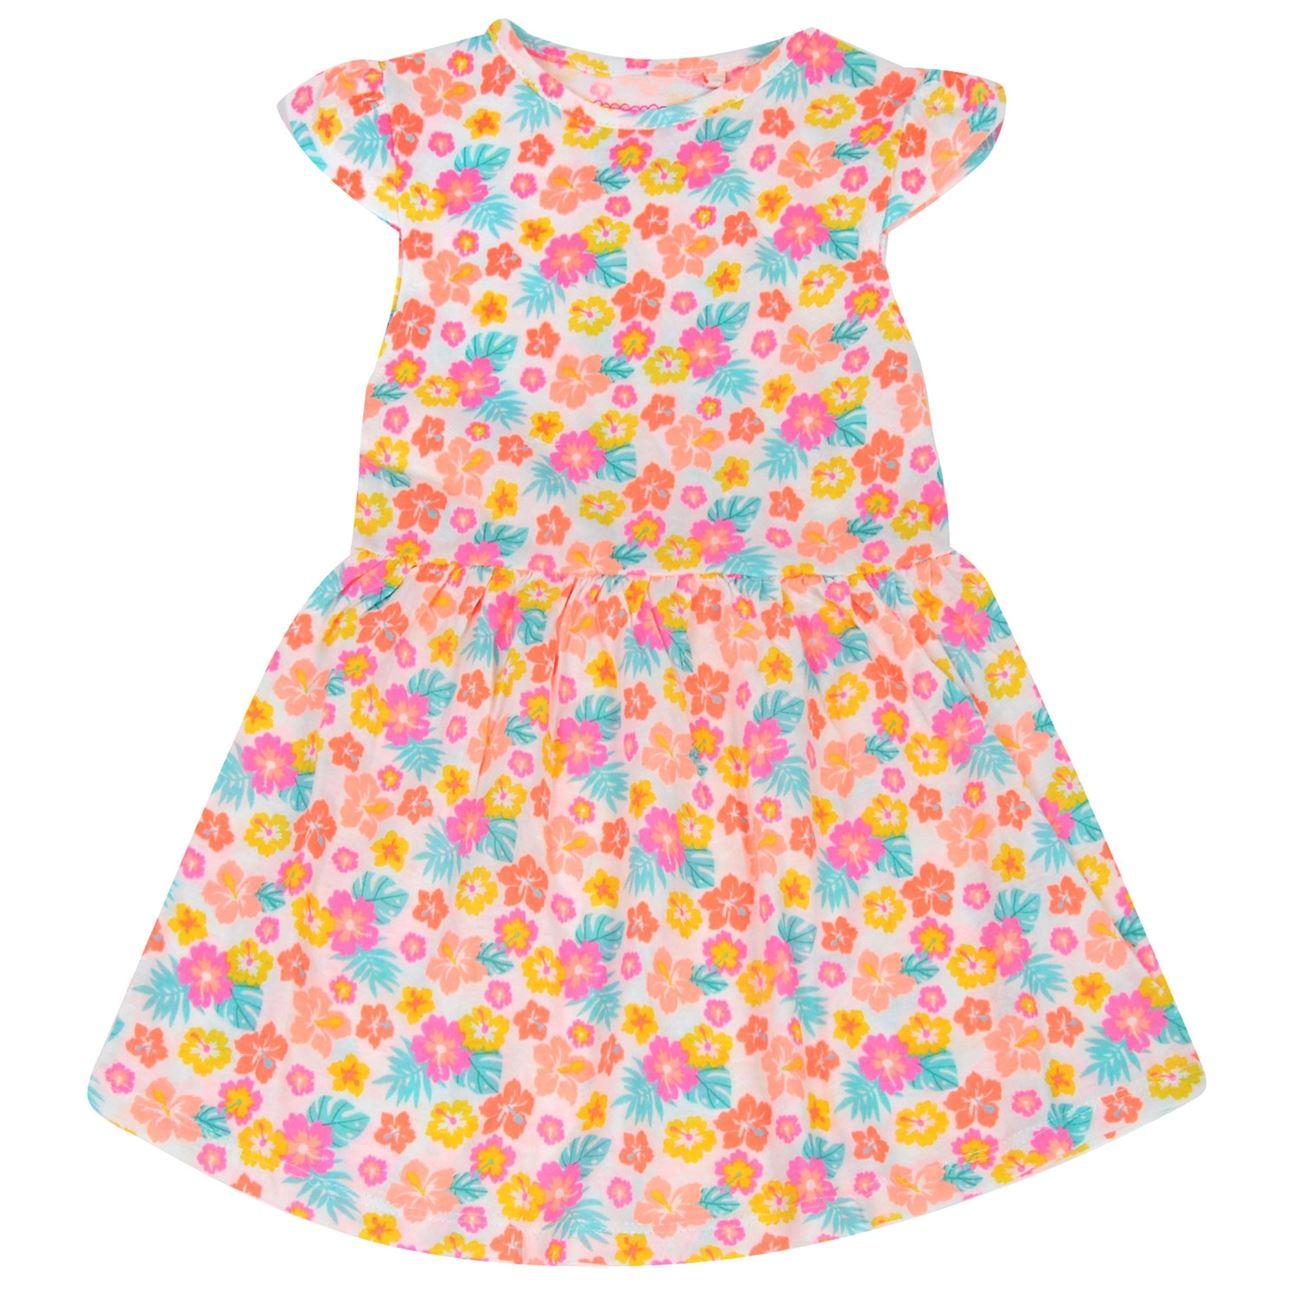 eca1d4d24a4 Φόρεμα Αμάνικο Παιδικό Λευκό Floral < Φορέματα για Κορίτσια | Jumbo